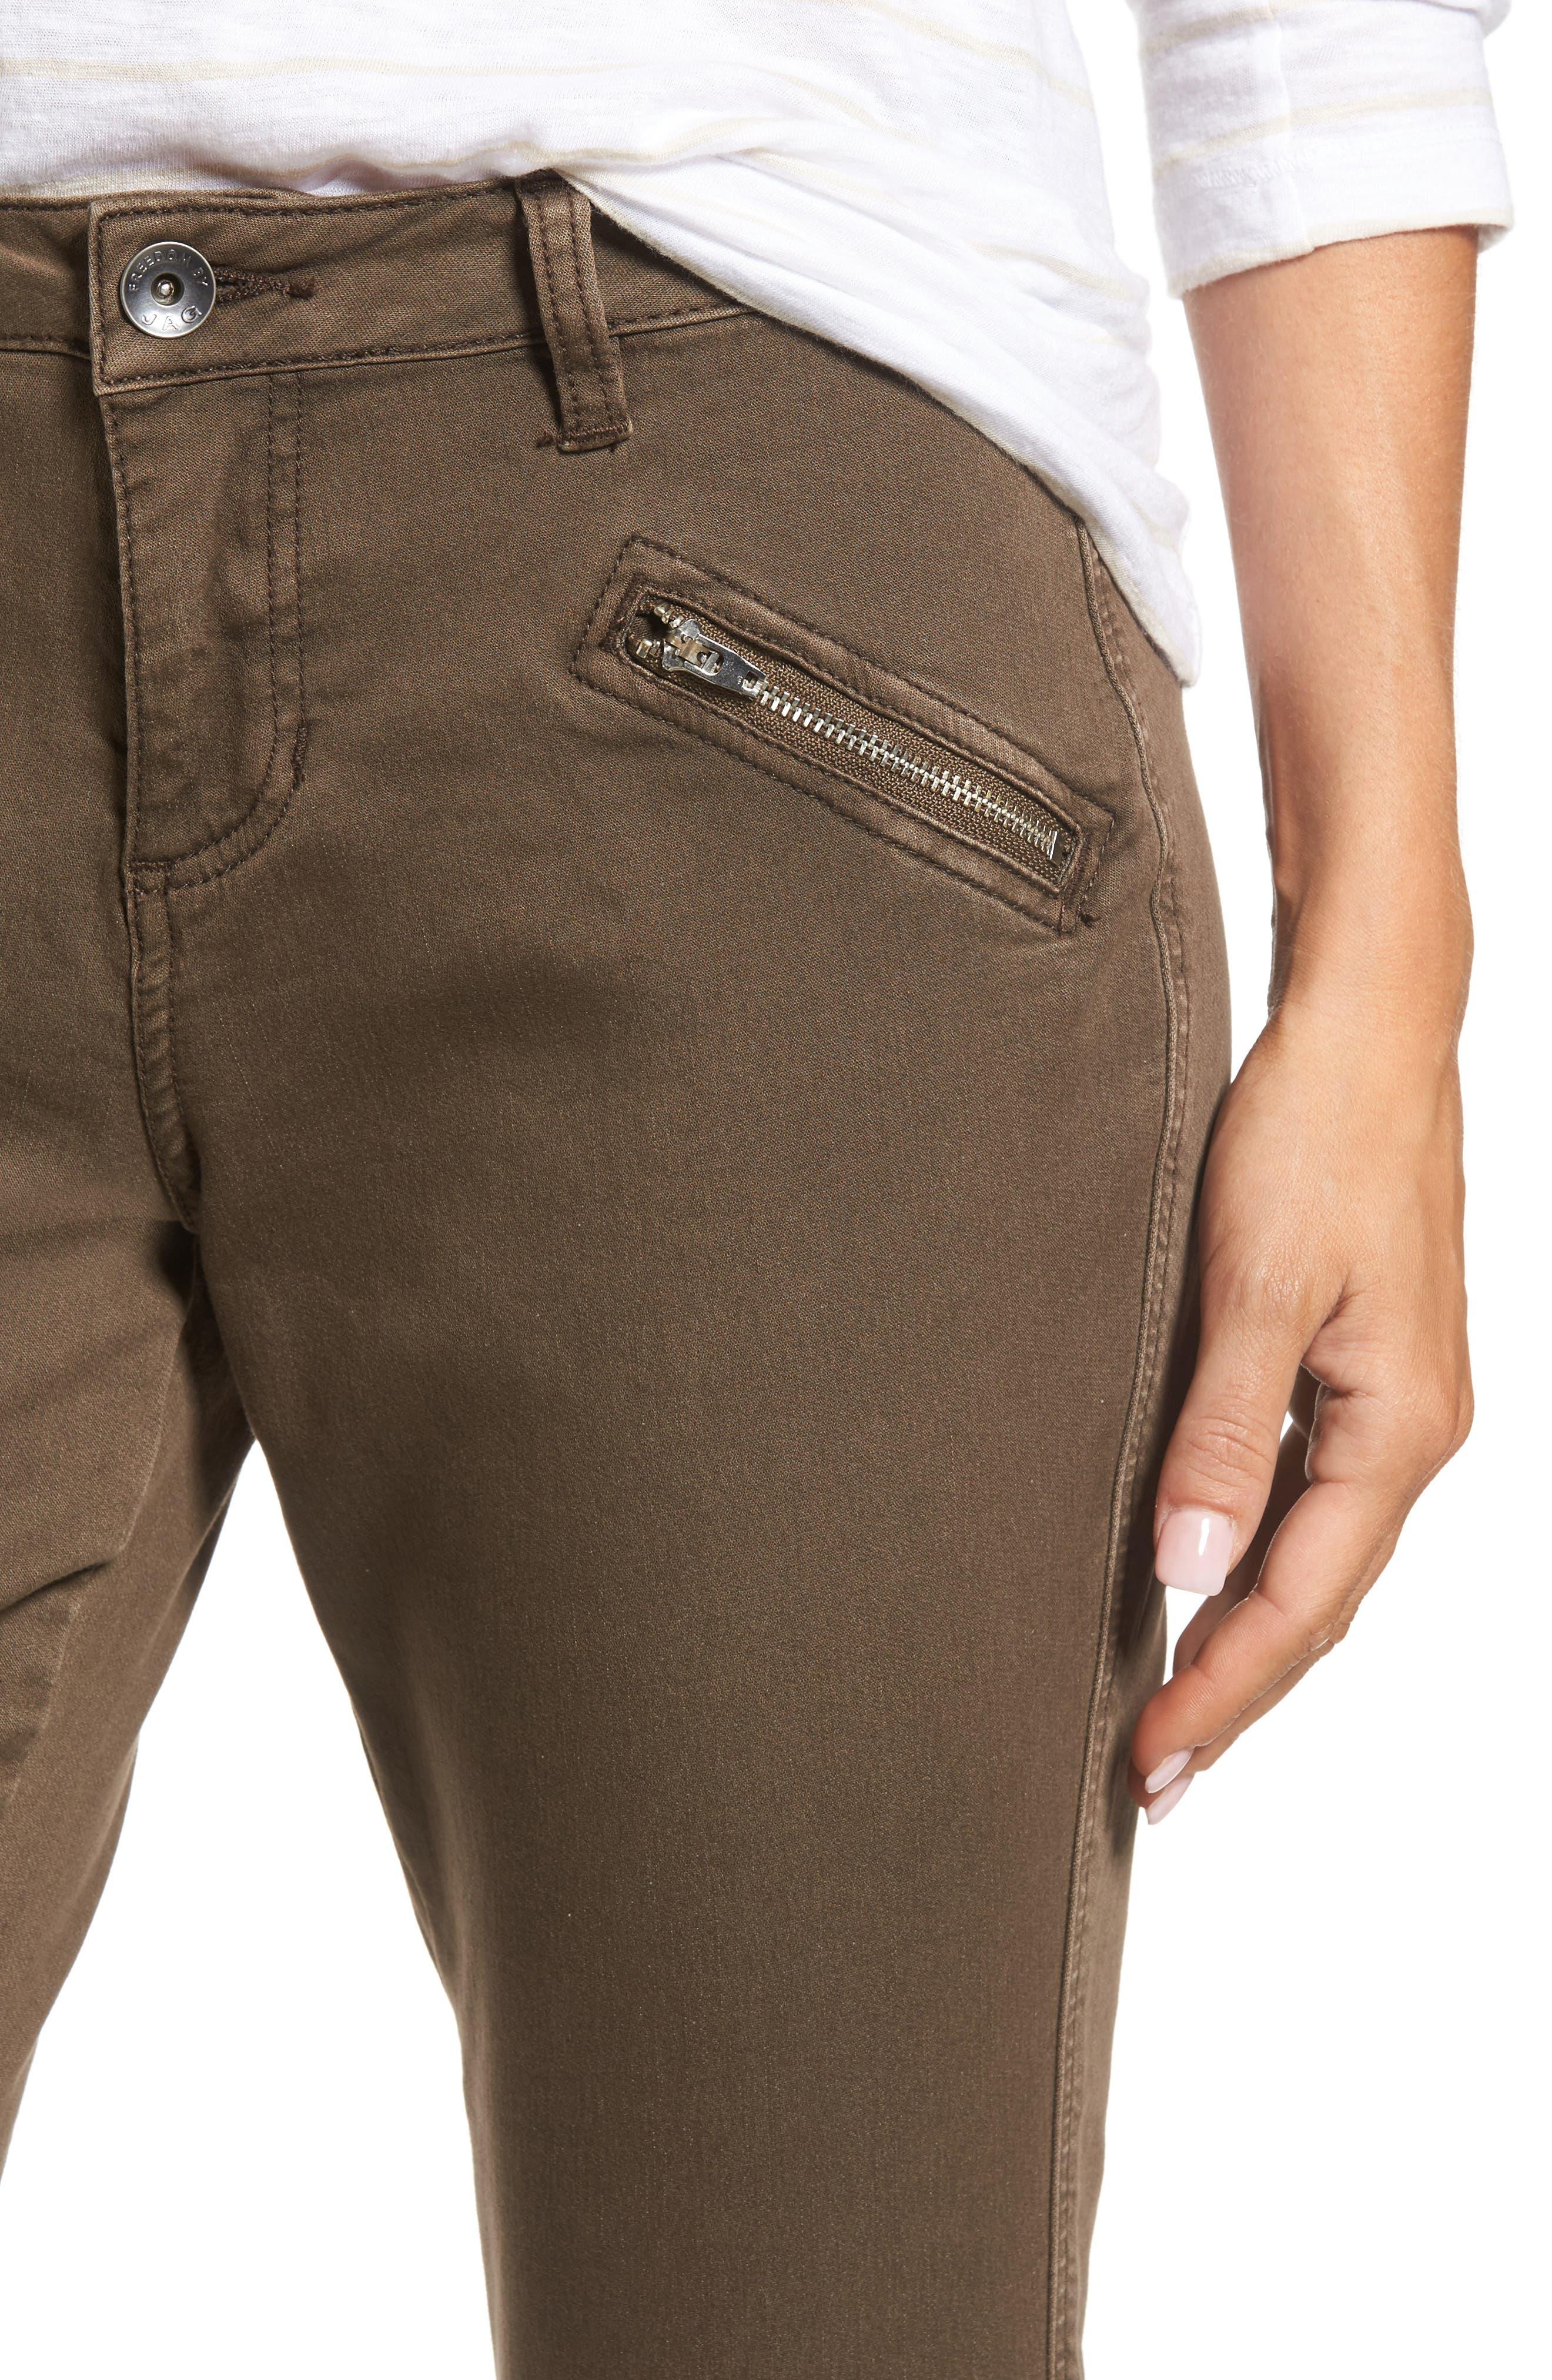 Ryan Knit Skinny Jeans,                             Alternate thumbnail 4, color,                             205